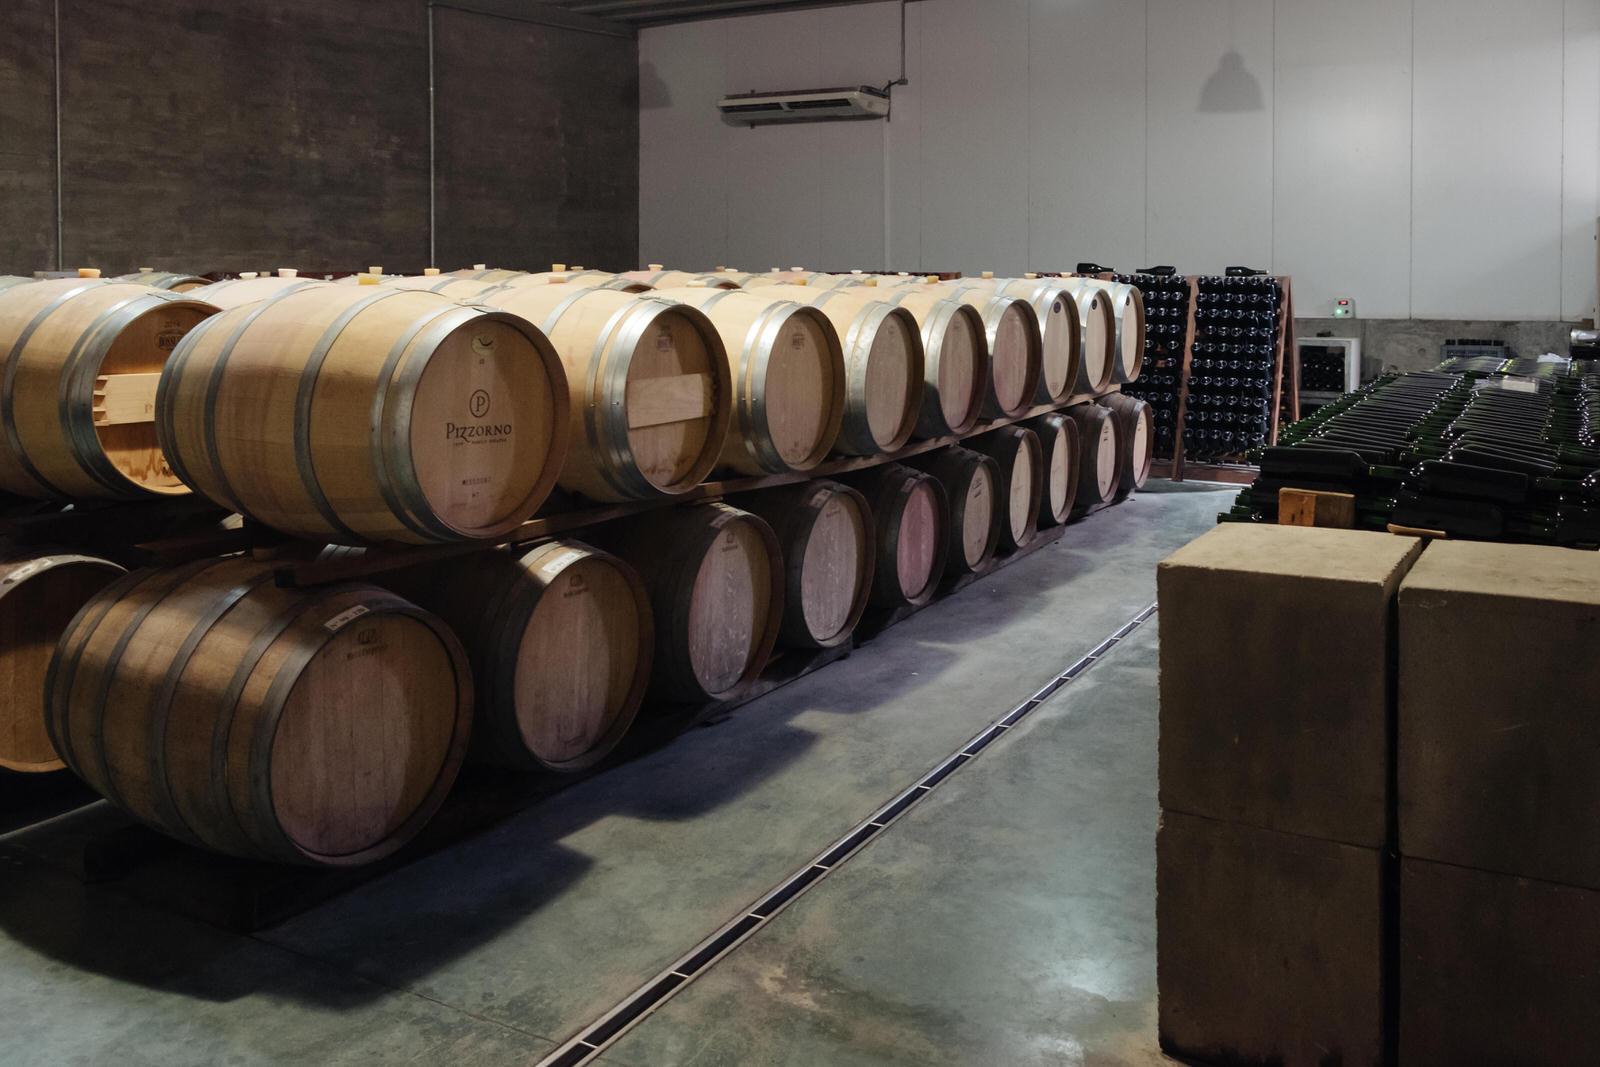 Visita a vinicola Pizzorno no Uruguai